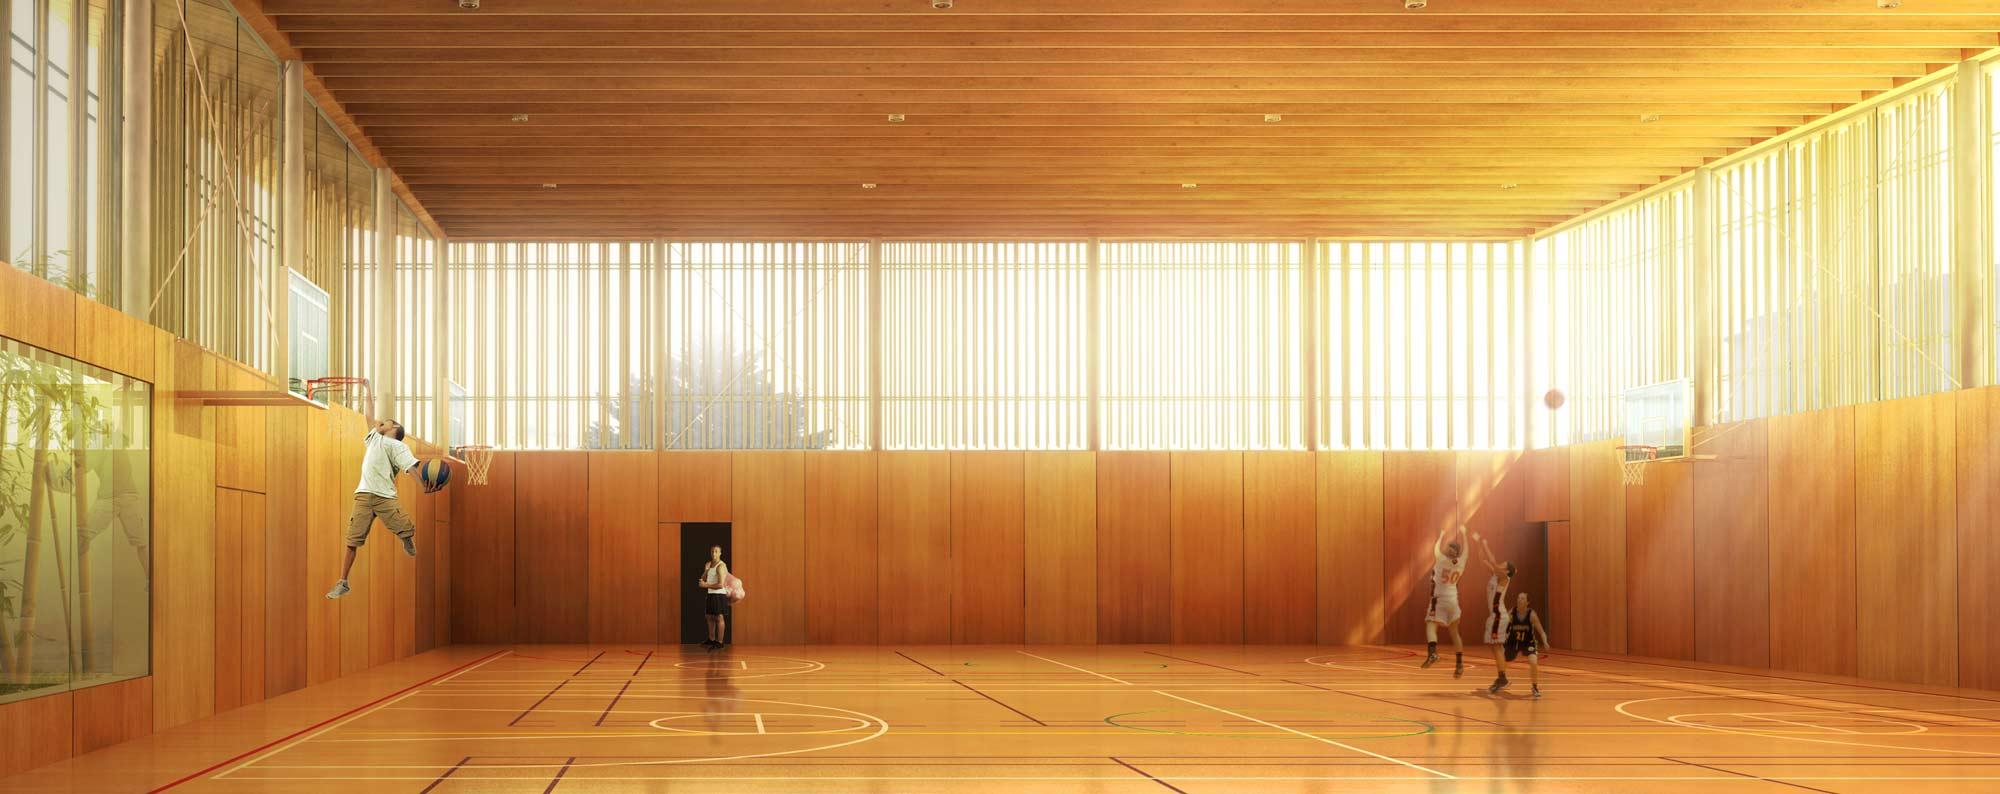 visualisation-3d-gymnase-vue-interieur